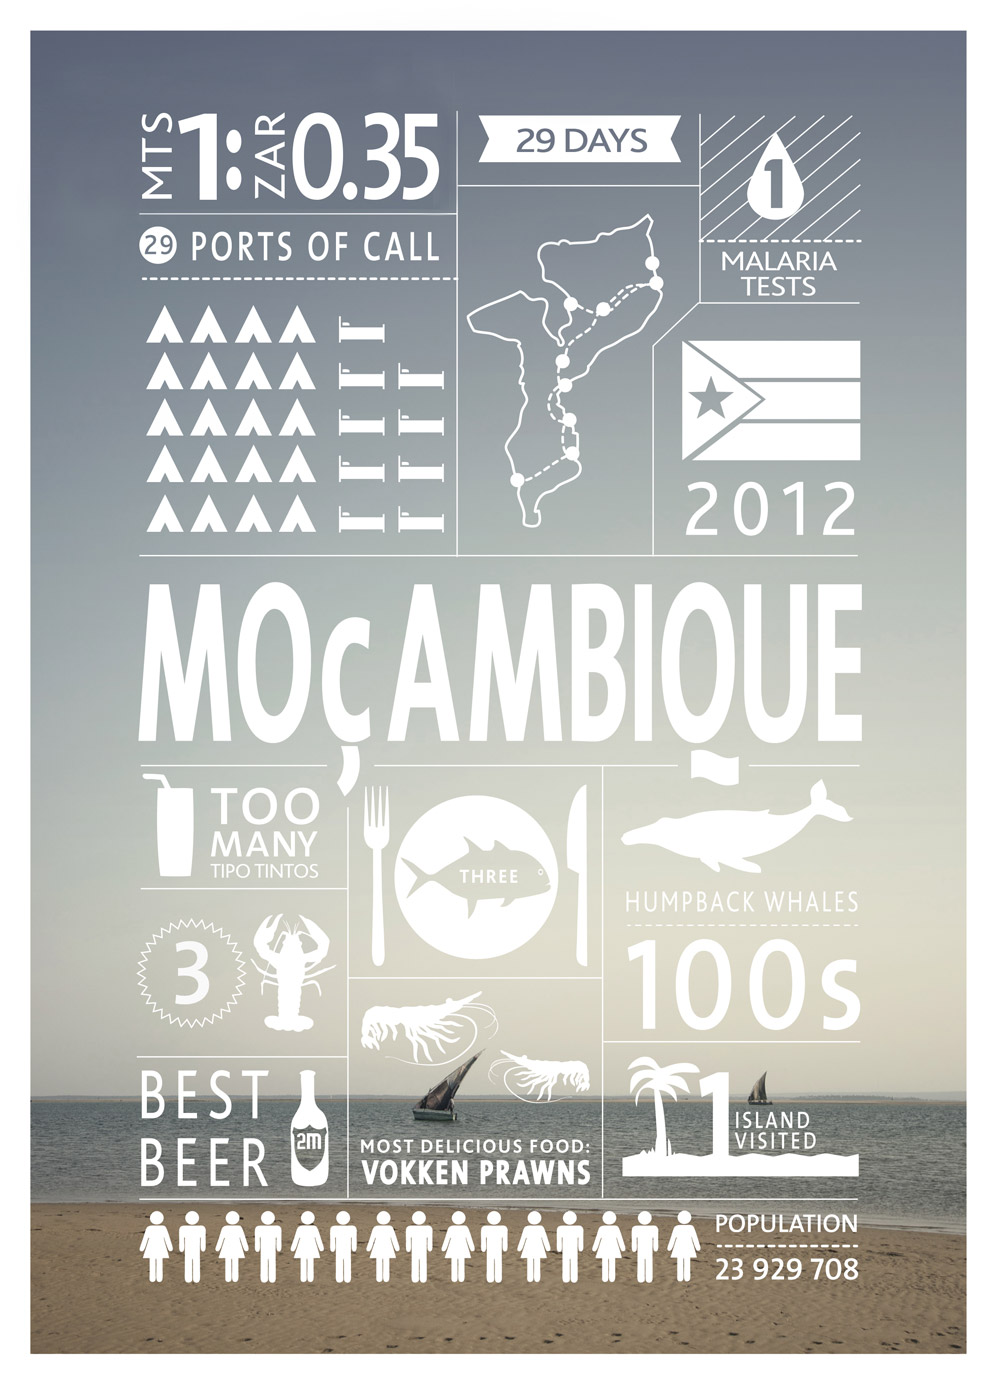 MOZAMBIQUE-UPDATE